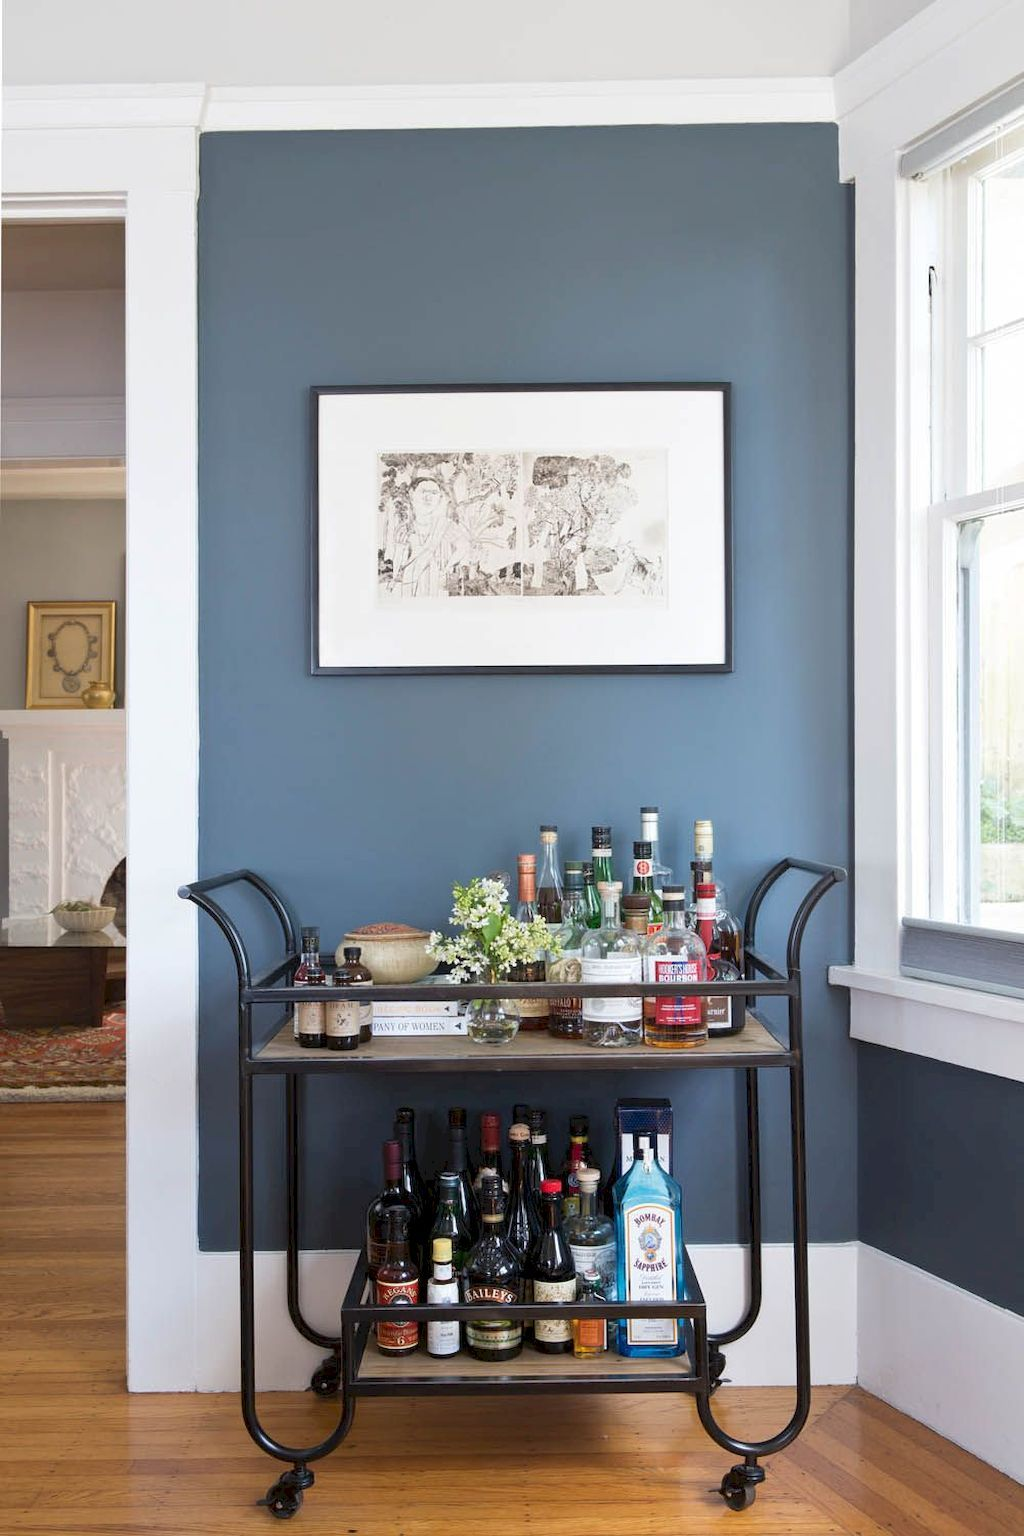 75 Rustic Farmhouse Dining Room Table Ideas #farmhousediningroom